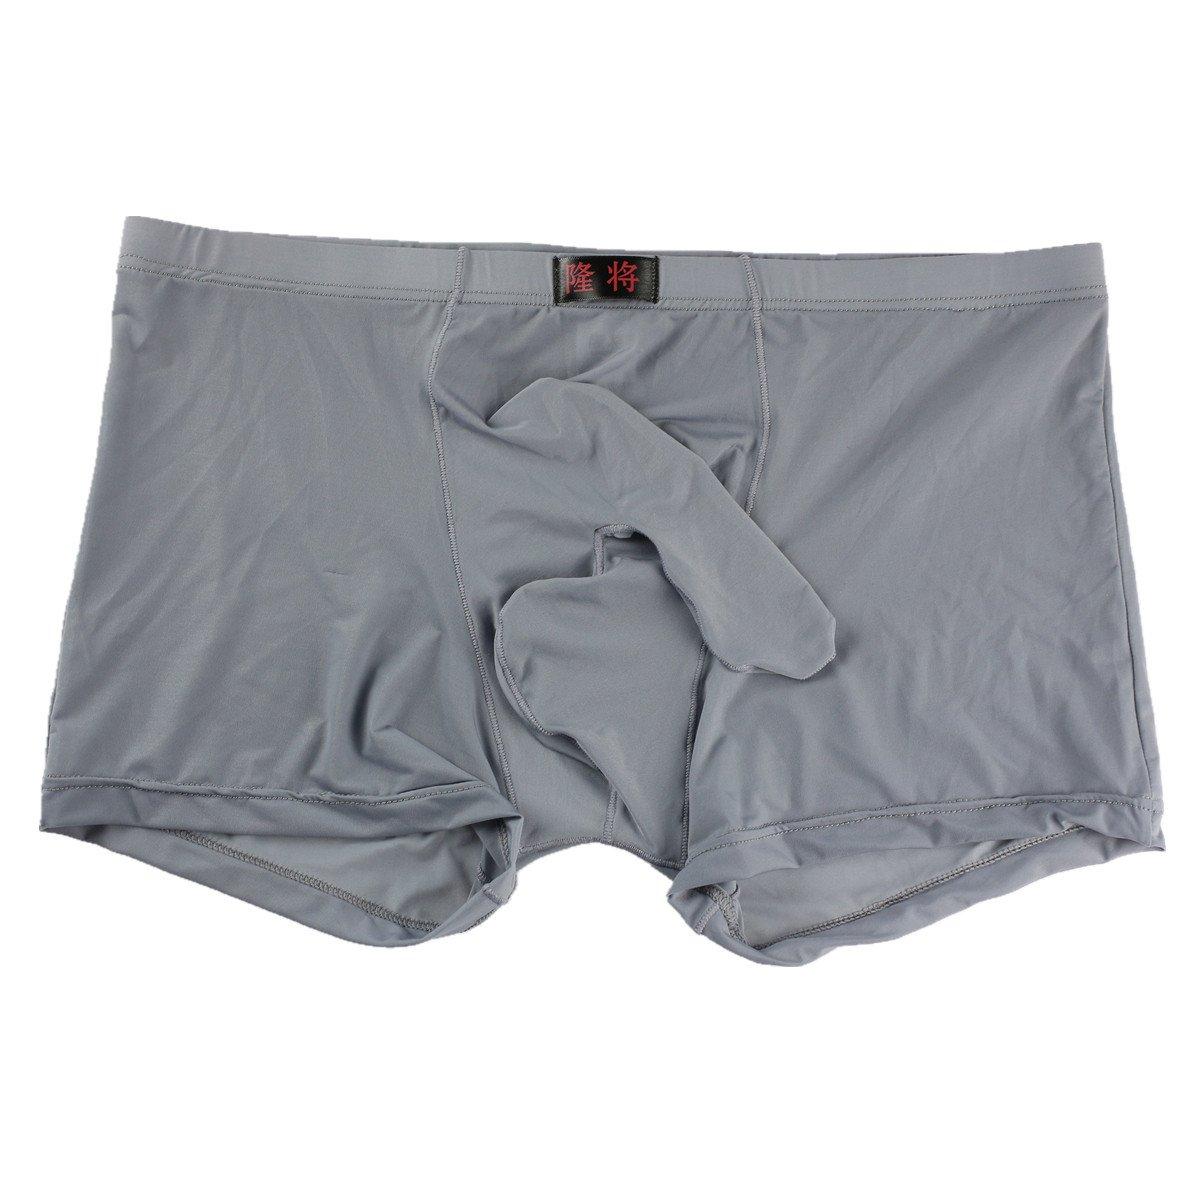 ALT Clearance 2017 Men 's Underwear Sexy Temptation Separation Ice Silk Translucent JJ Sets (Small, Grey)